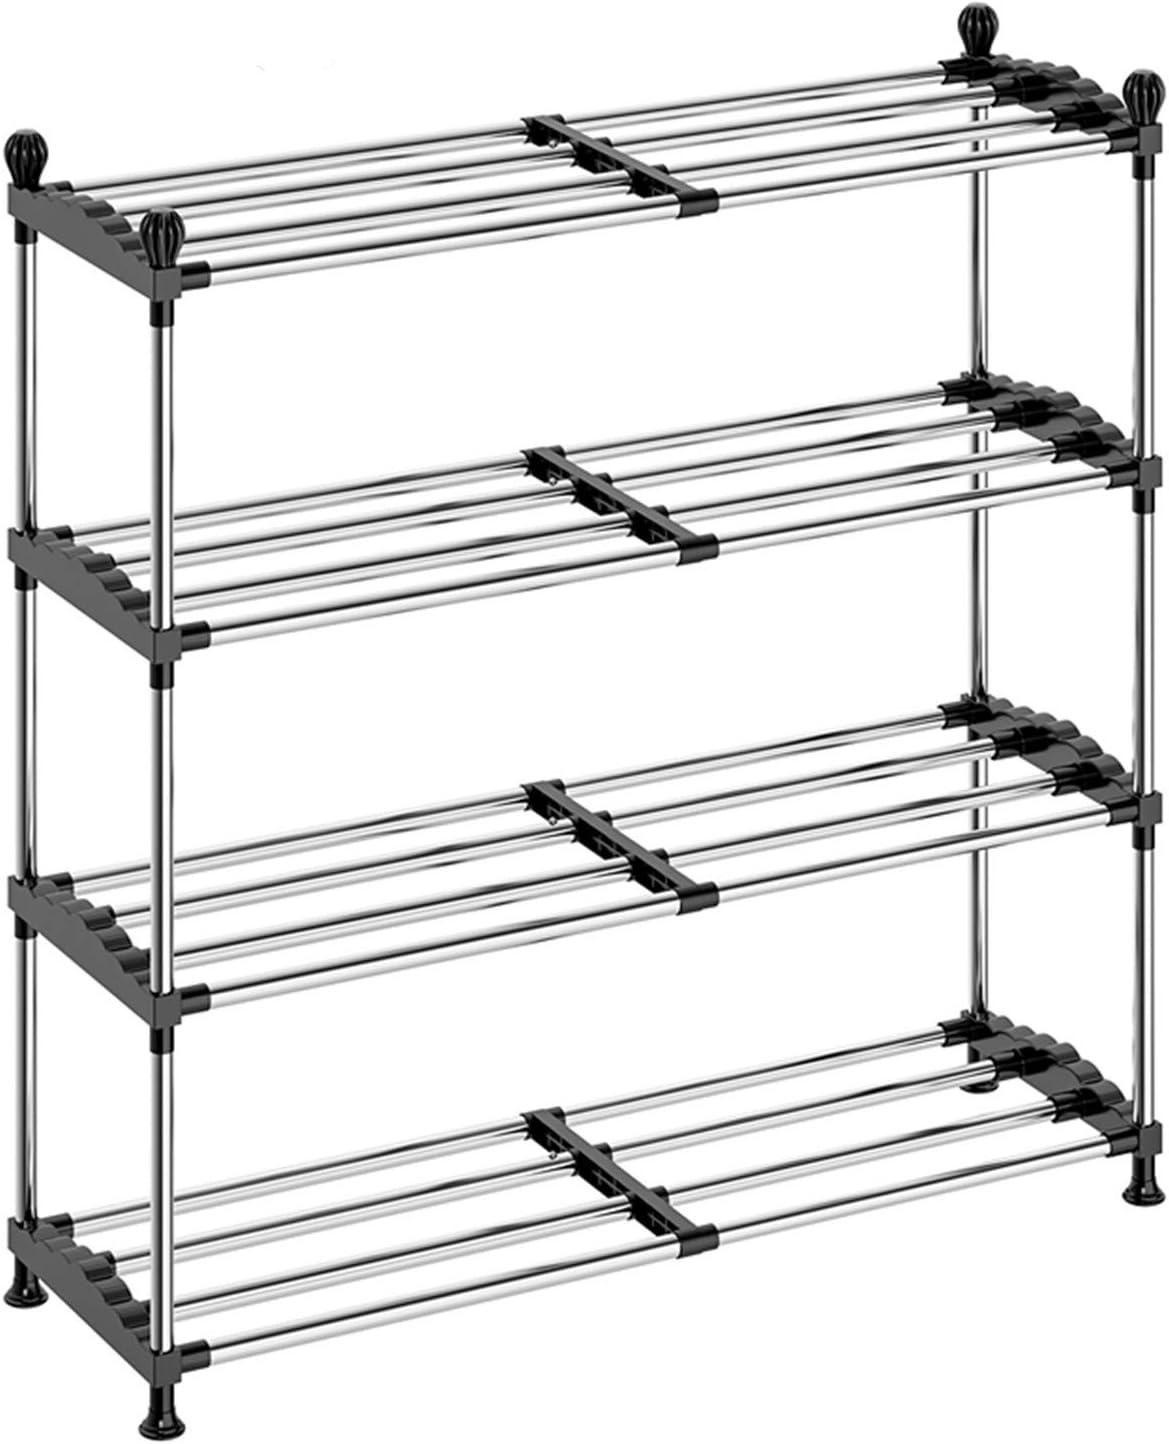 Shoe Philadelphia Mall 2021 model Rack Organizer for Closet Entryway Expandable DUSASA 4-Tier